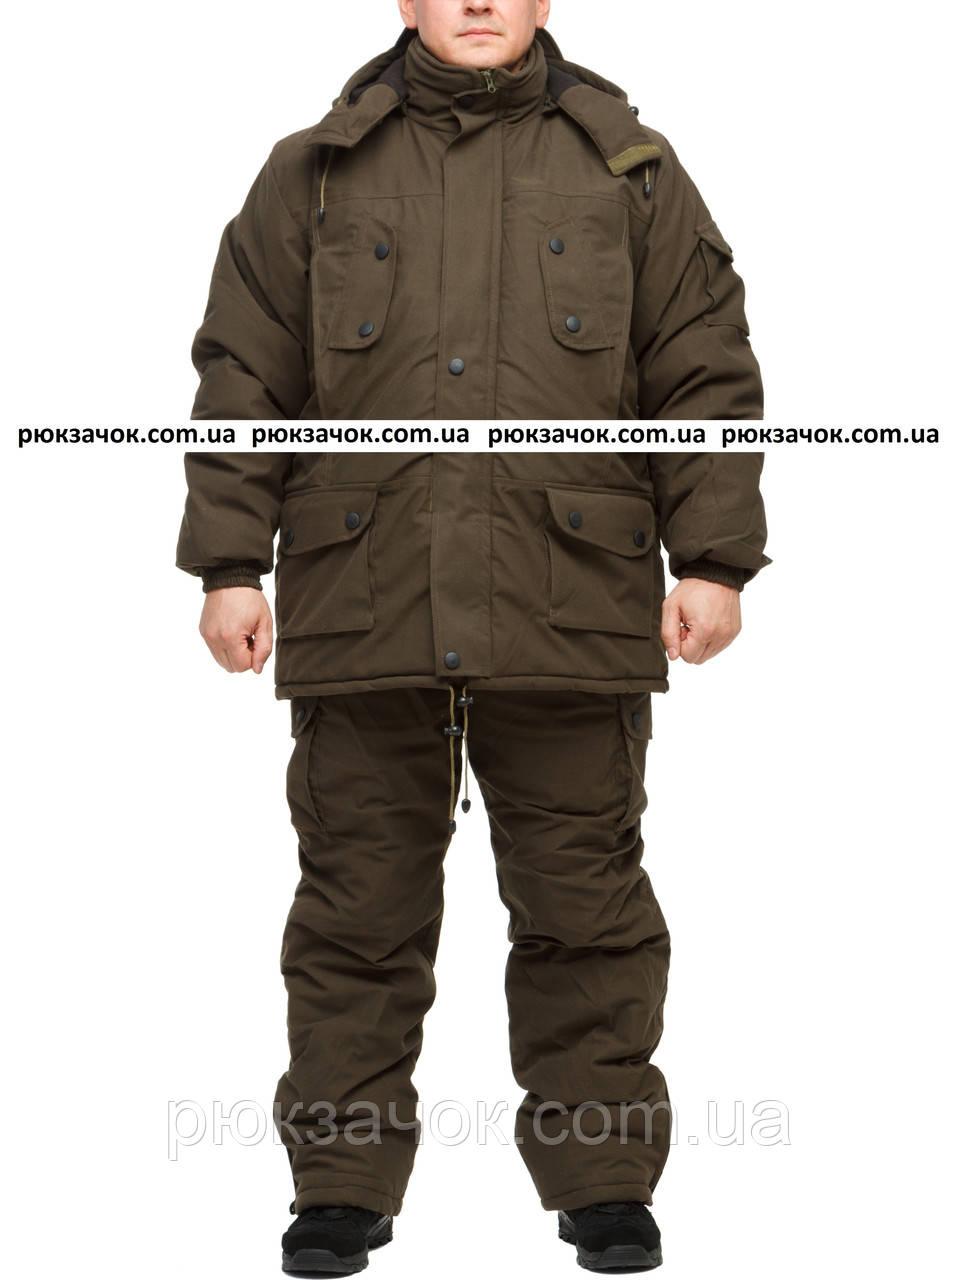 "Теплый охотничий костюм на зиму ""Хаки"" размер 60-62"